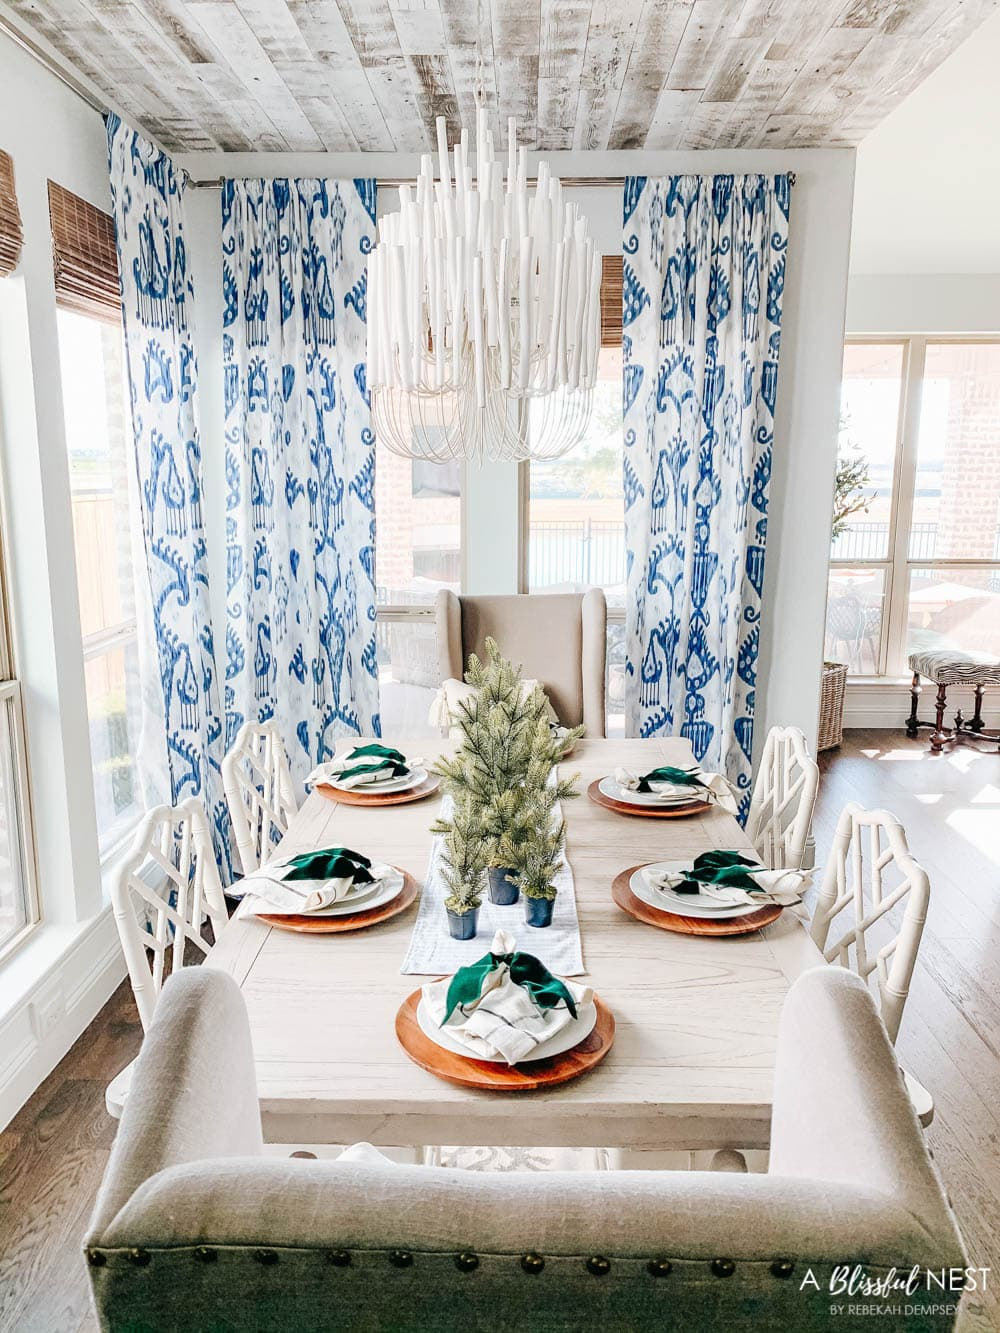 Blue and white dining room with Christmas decor. #ABlissfulNest #christmasdecor #diningroom